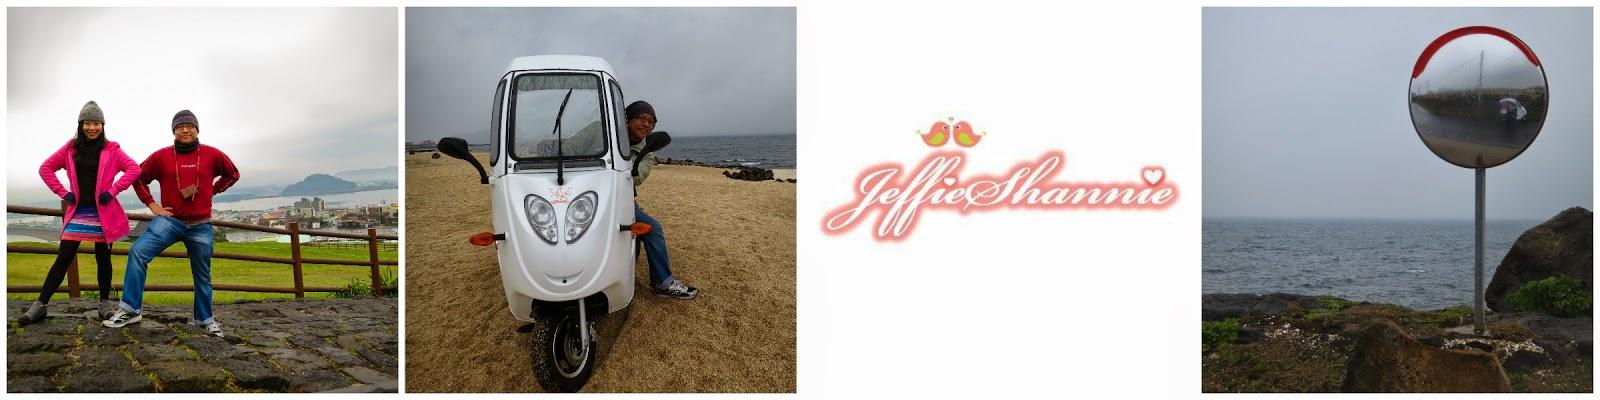 http://jeffieshannie.blogspot.sg/2014/06/day-5-summary-seongsan-ilchulbong-peak.html